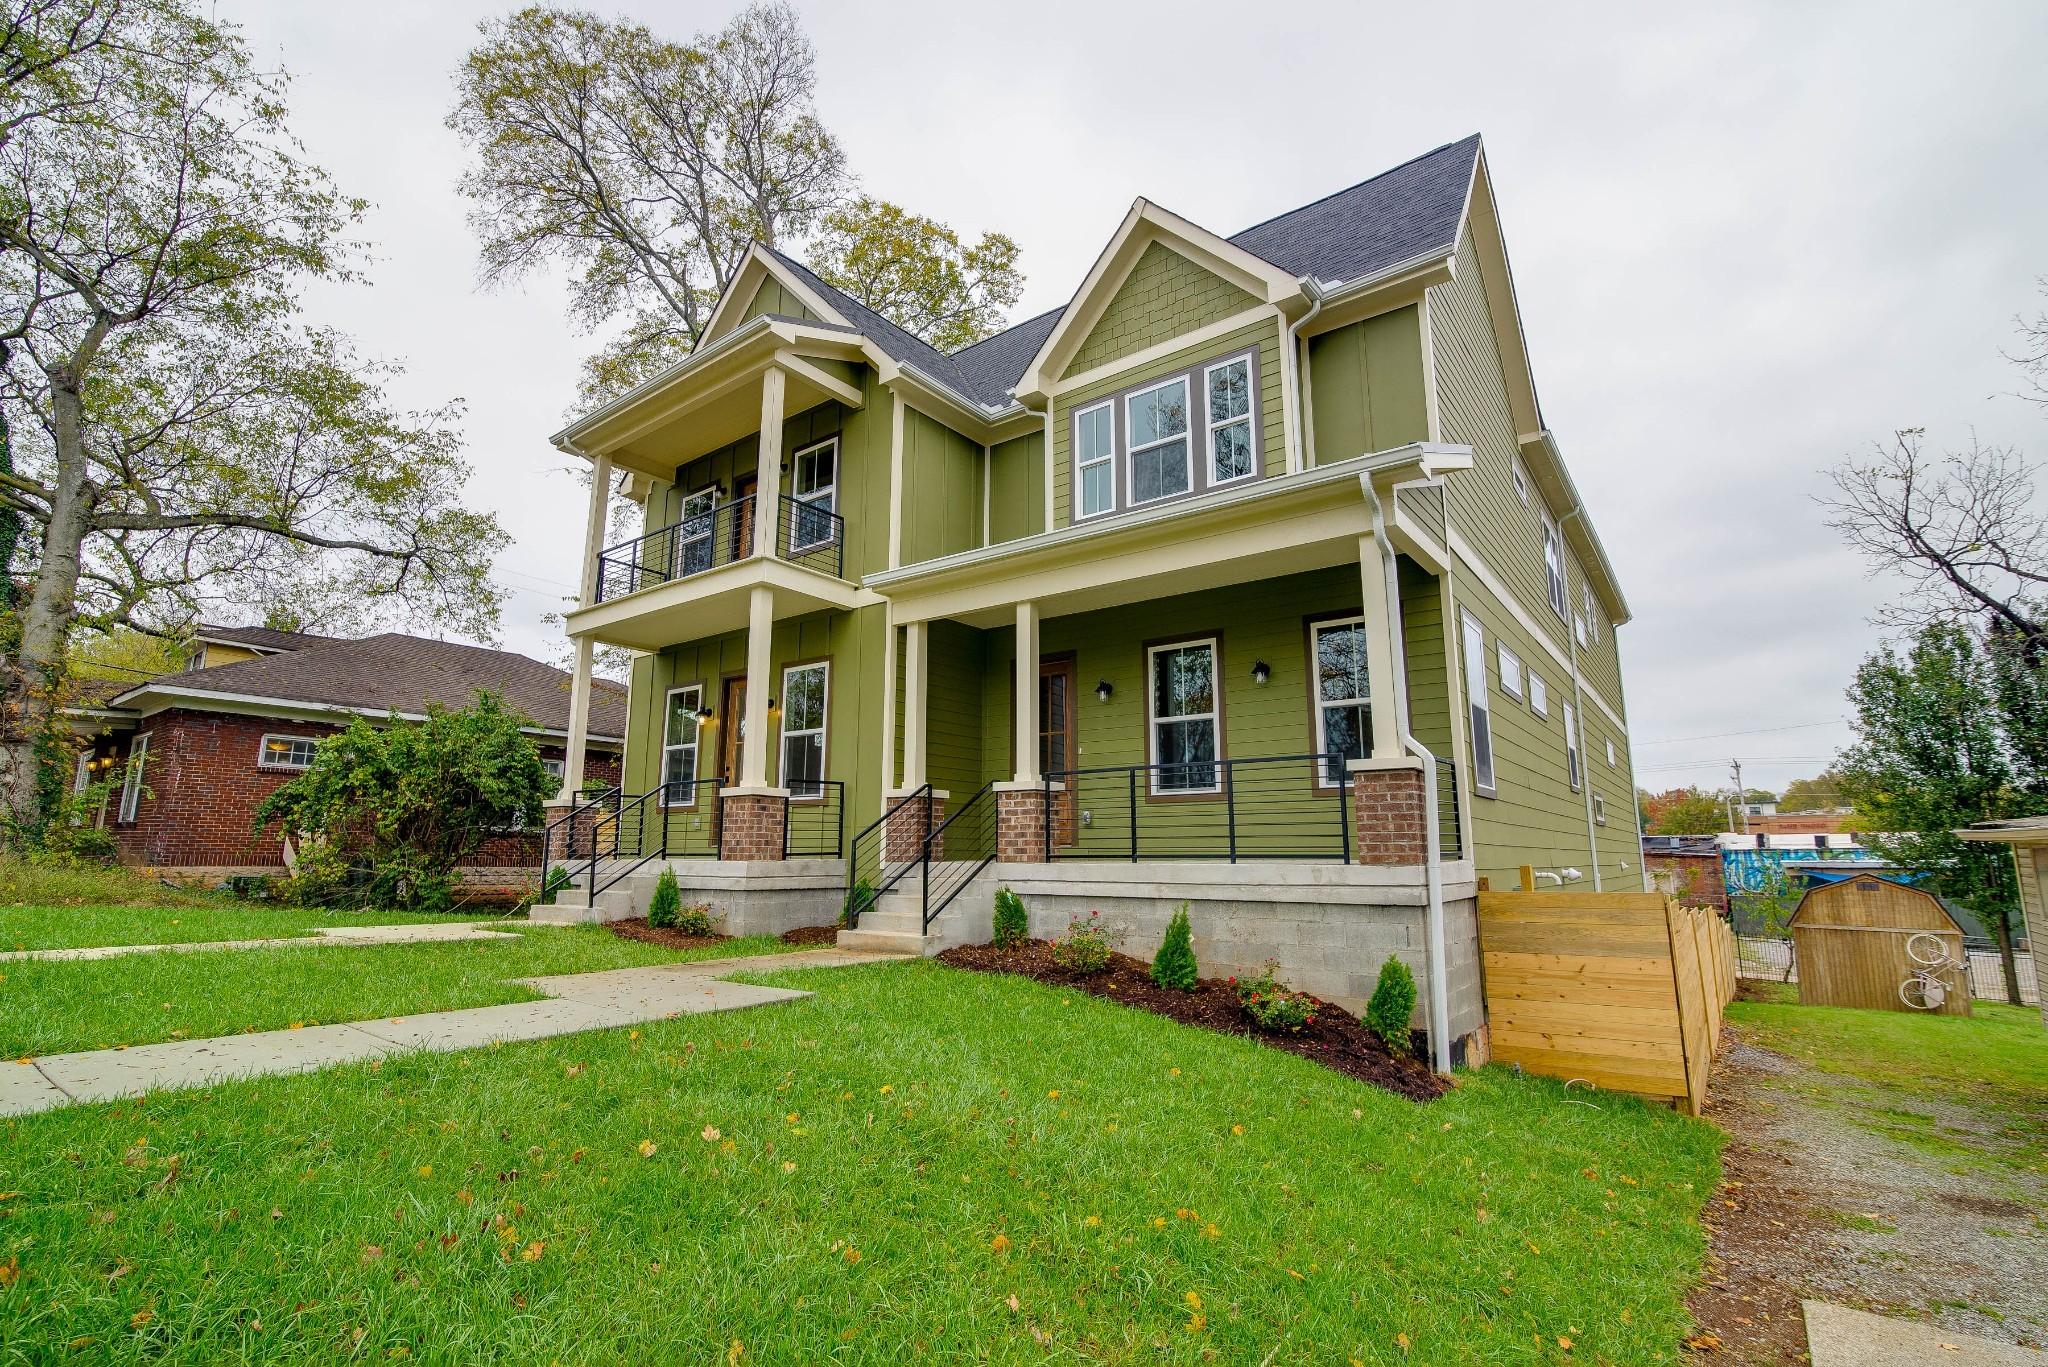 2510A Trevecca Ave, Nashville, TN 37206 - Nashville, TN real estate listing